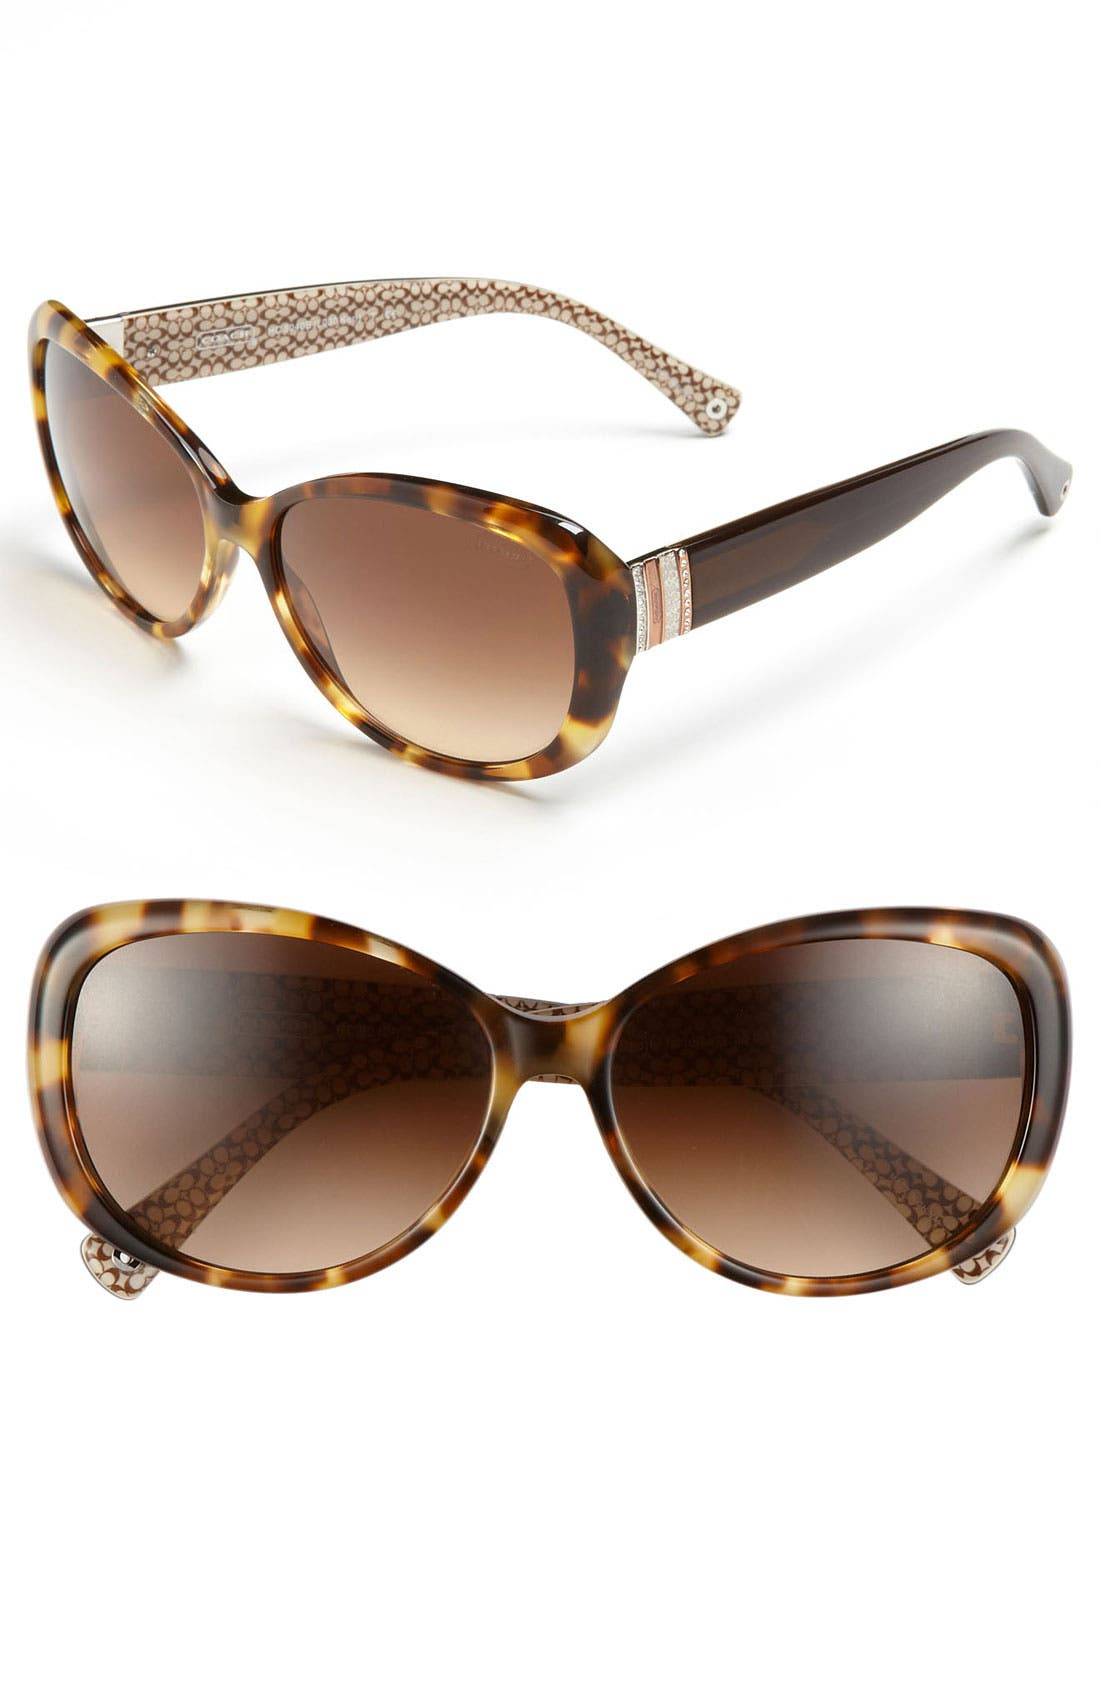 Main Image - COACH 58mm Oversized Sunglasses